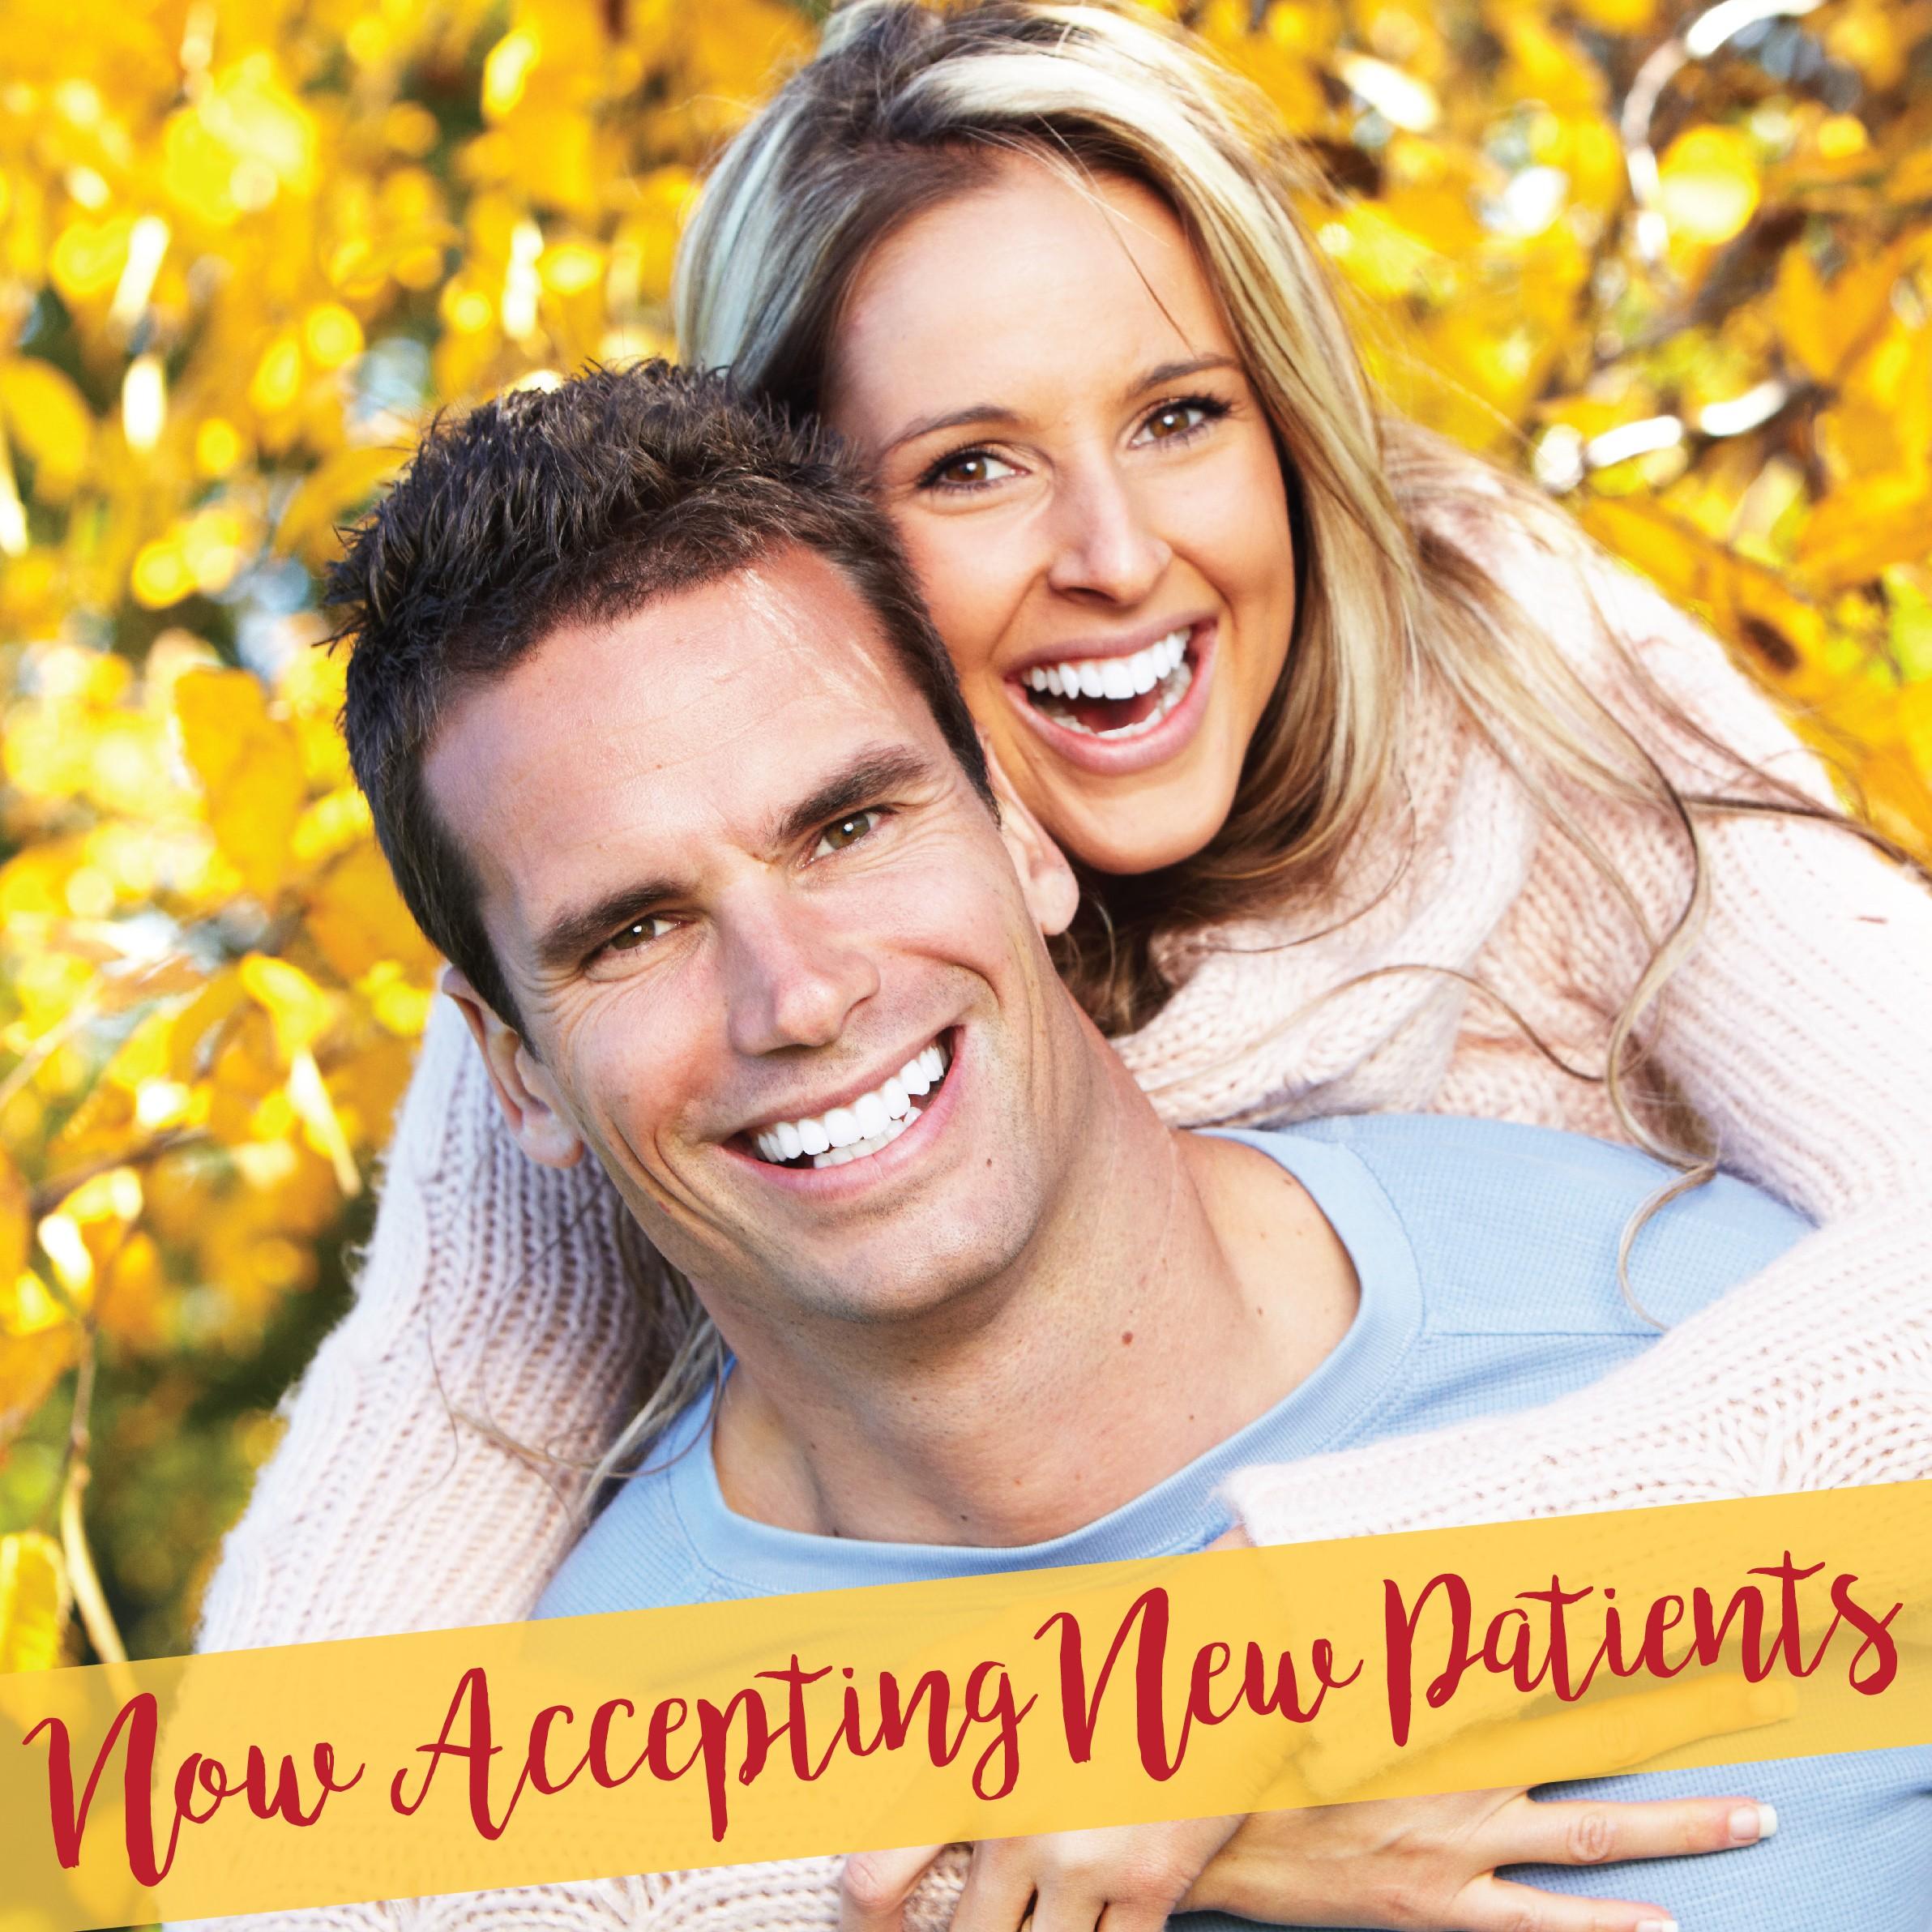 new patients at paragould dentist